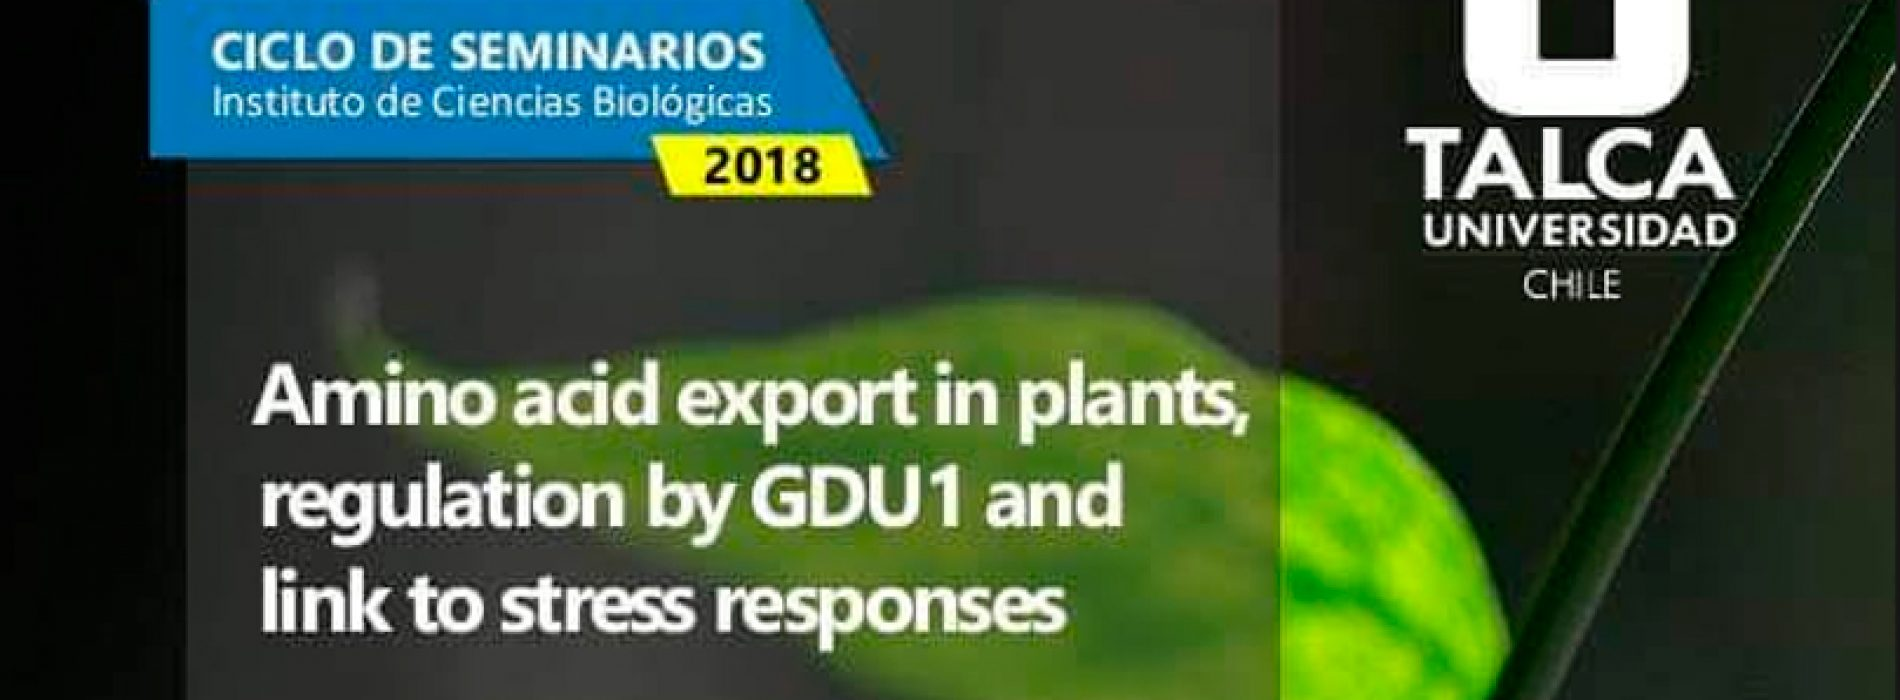 Ciclo de seminarios – Amino acid export in plants, regulation by GDU1 and link to stress responses